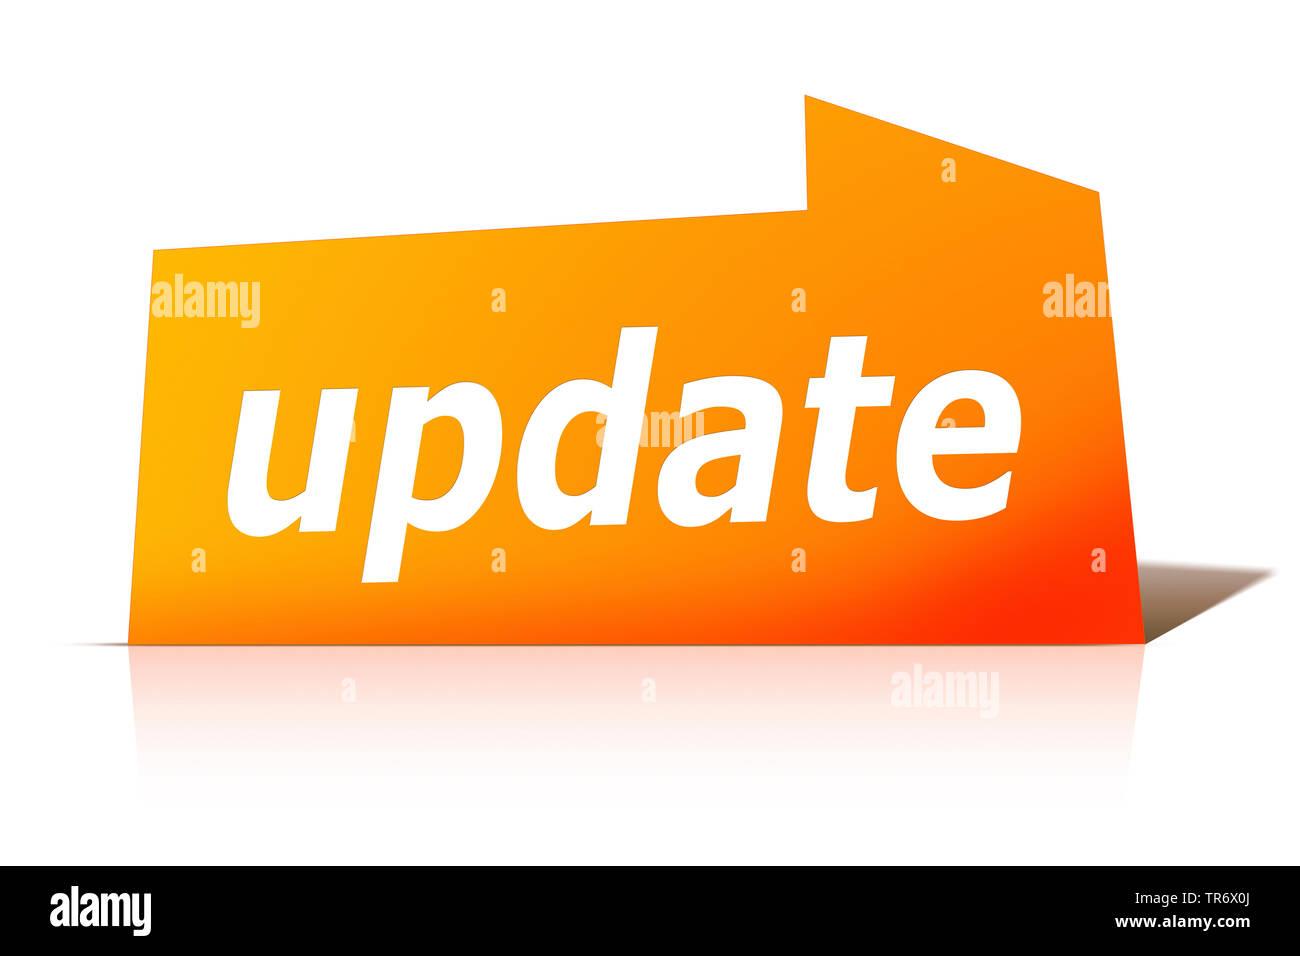 3D Computergrafik, orange Sprechblase mit Text UPDATE, Europa | 3D computer graphic, orange speech bubble reading UPDATE, Europe | BLWS491628.jpg [ (c - Stock Image